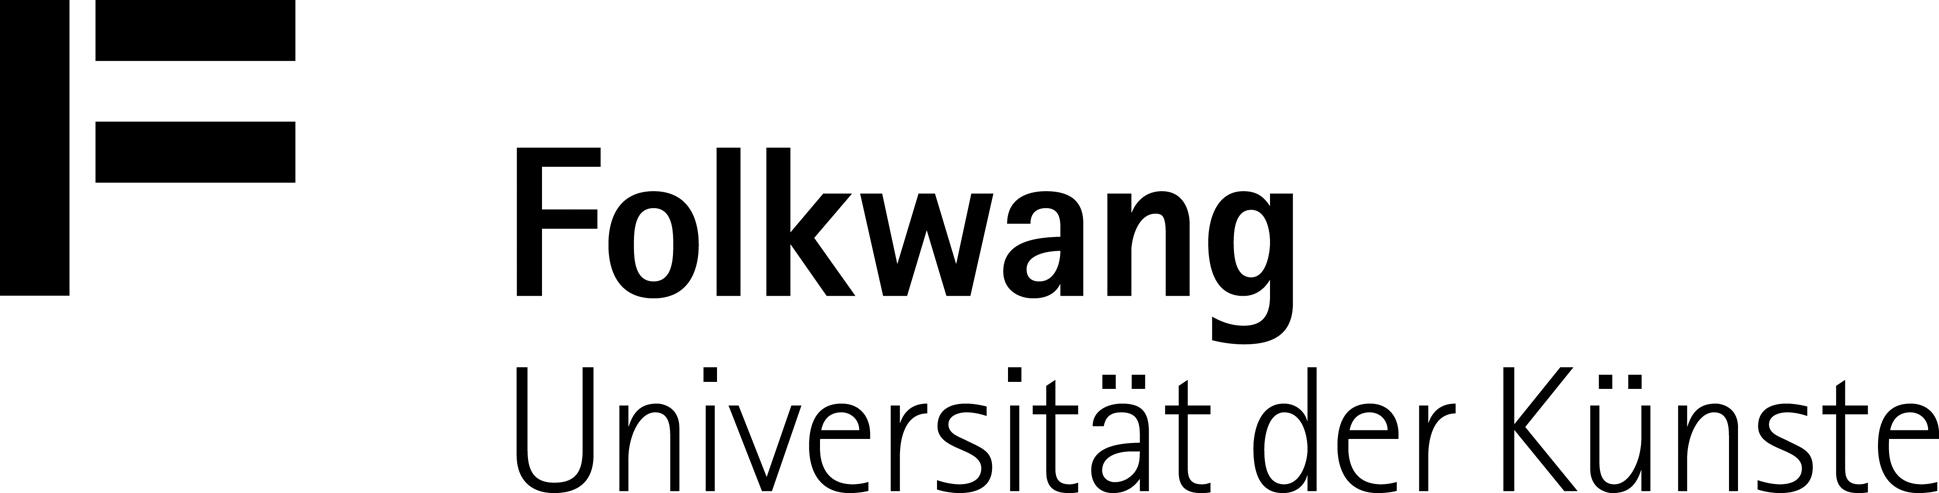 folk_logo CMYK DT.indd